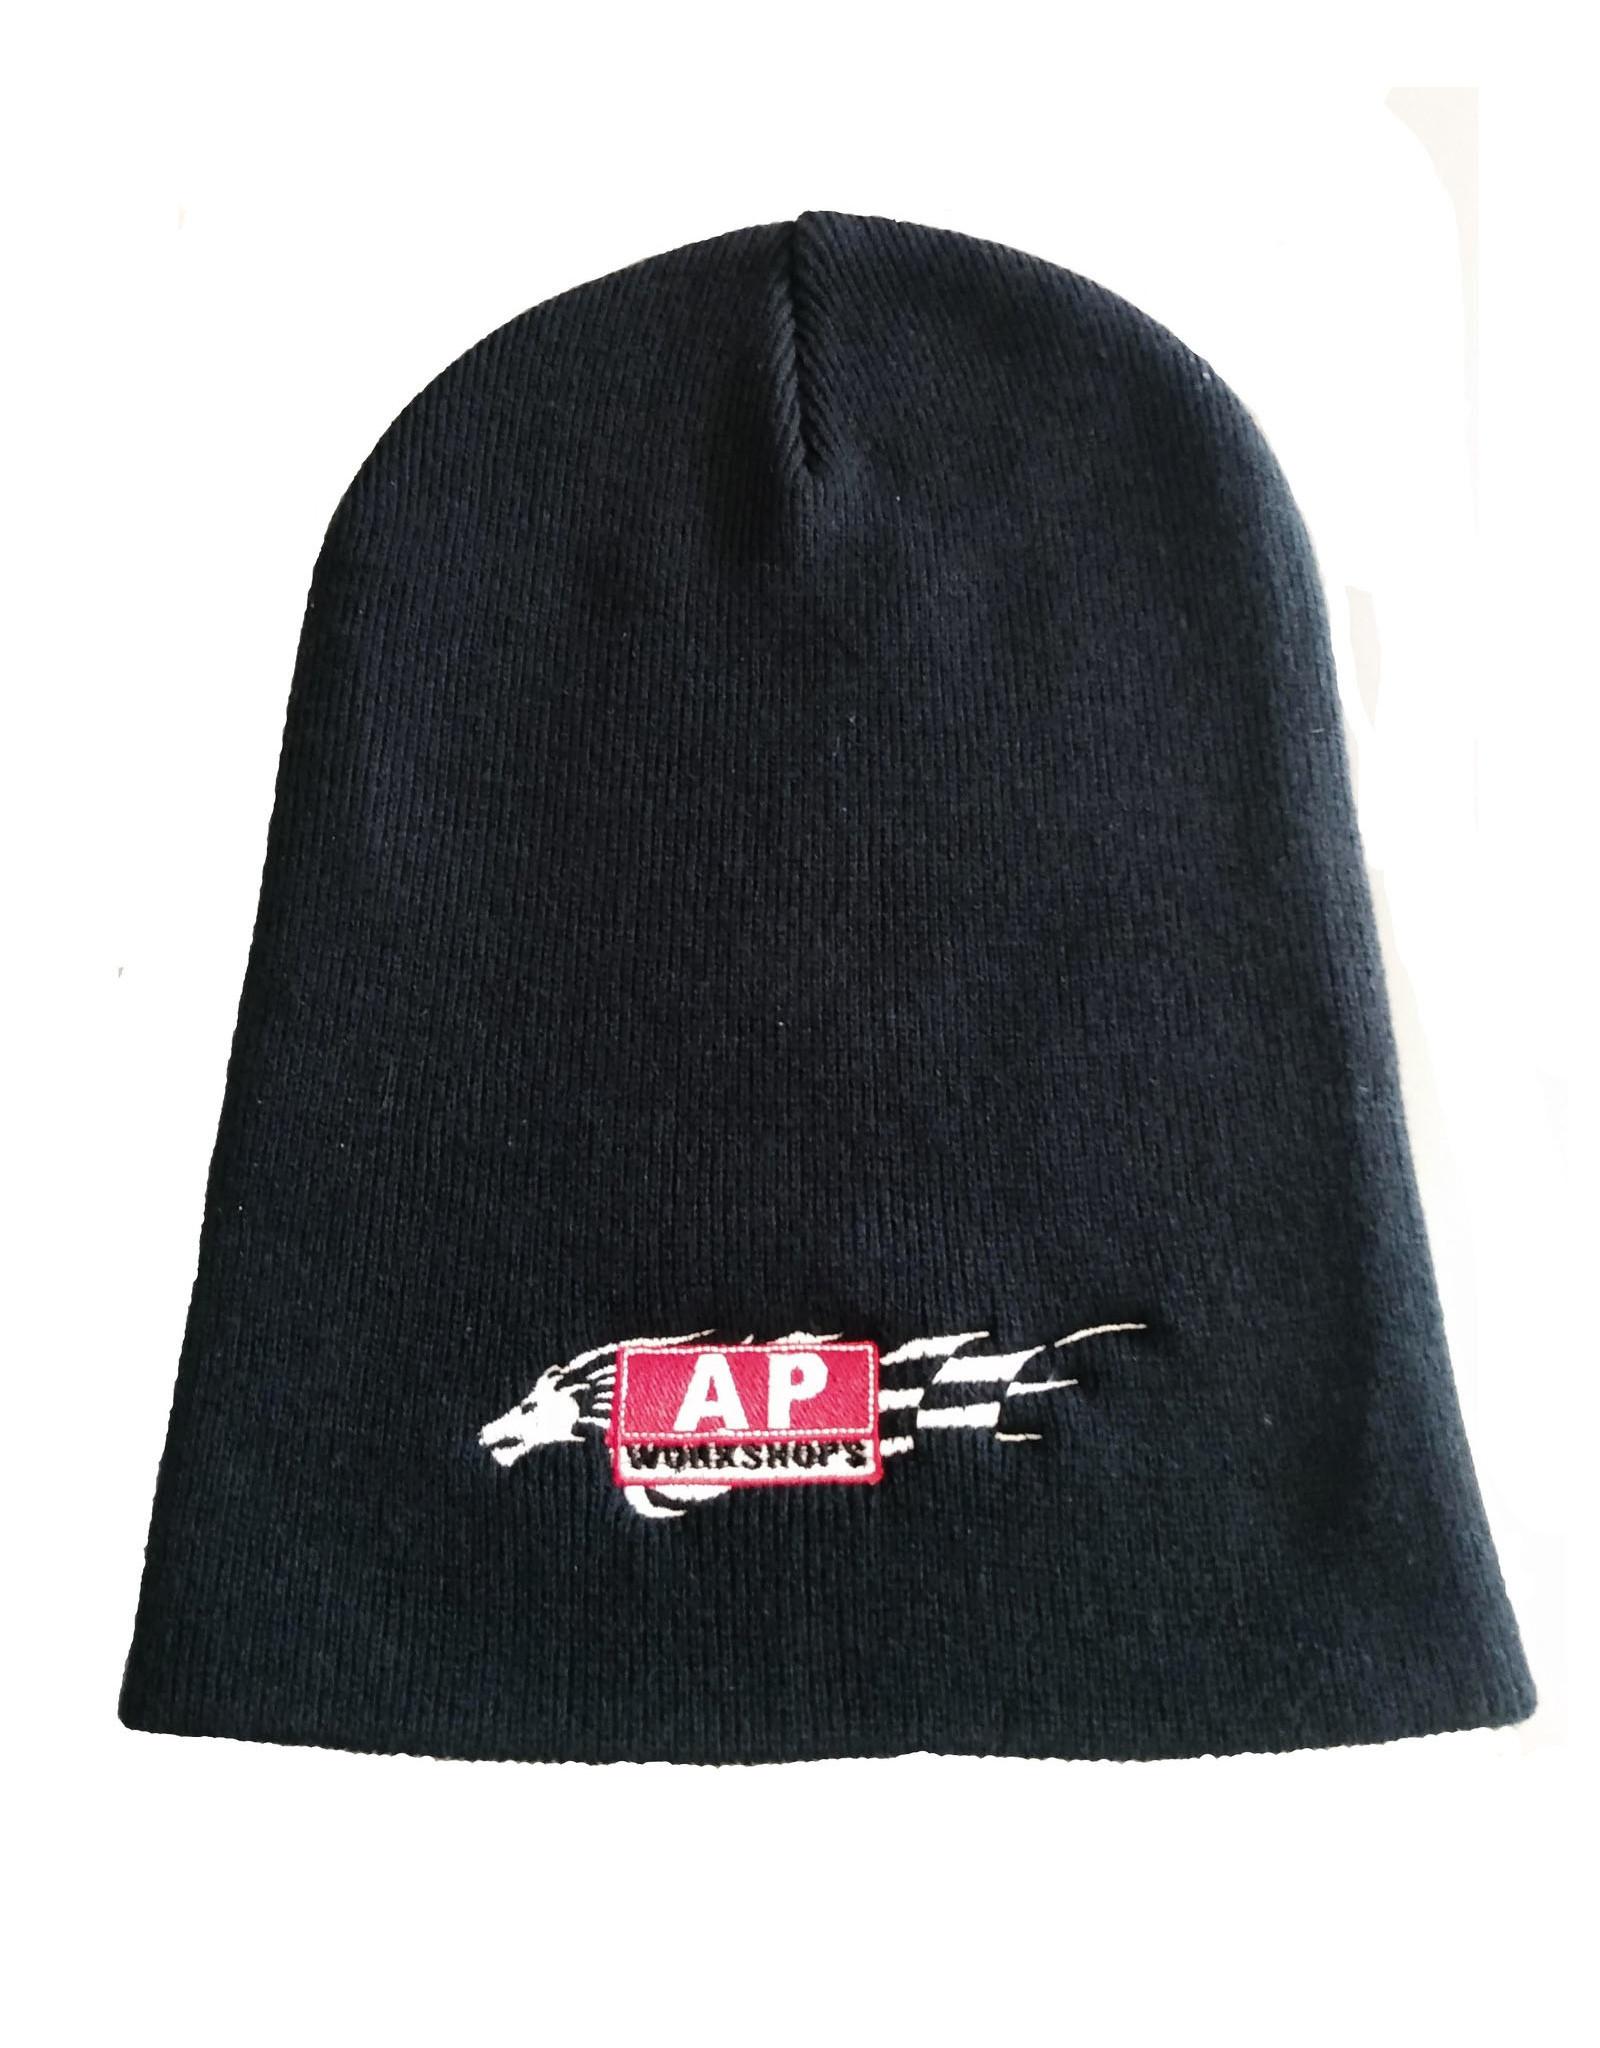 AP workshops AP workshops beanie , slouch fit